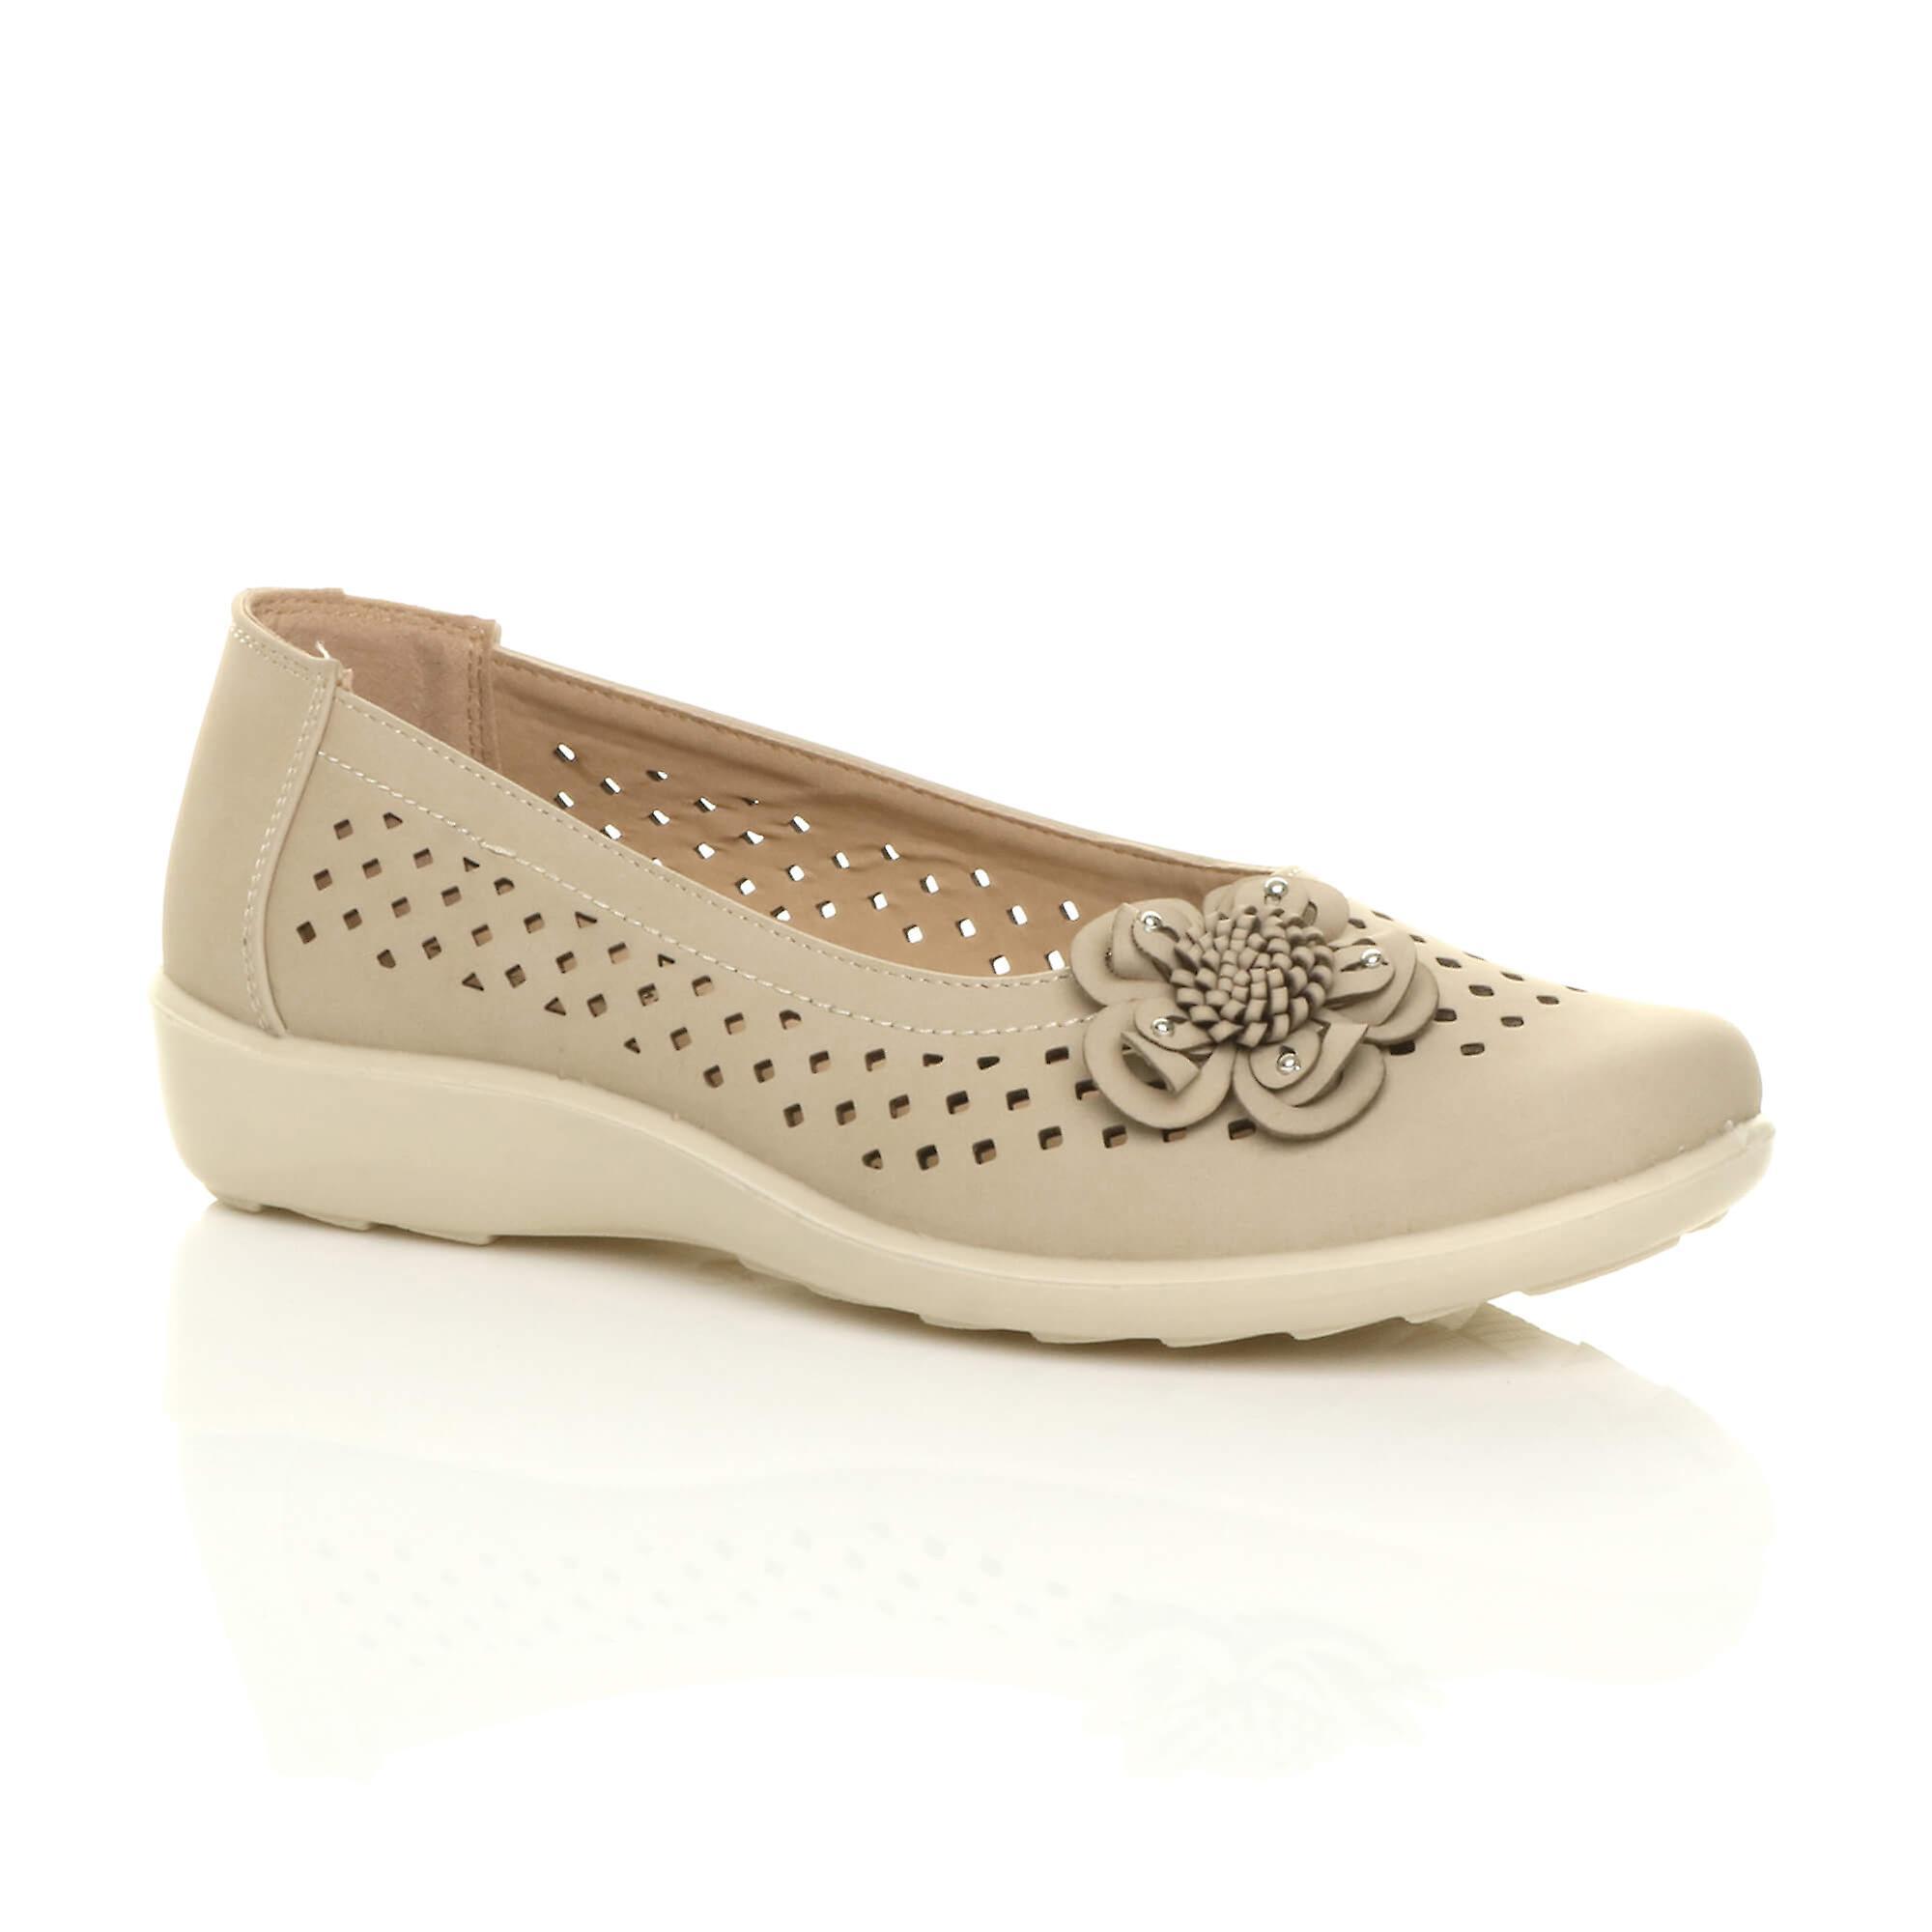 Ajvani womens flat grip sole padded cushioned comfort shoes flower summer ballerinas